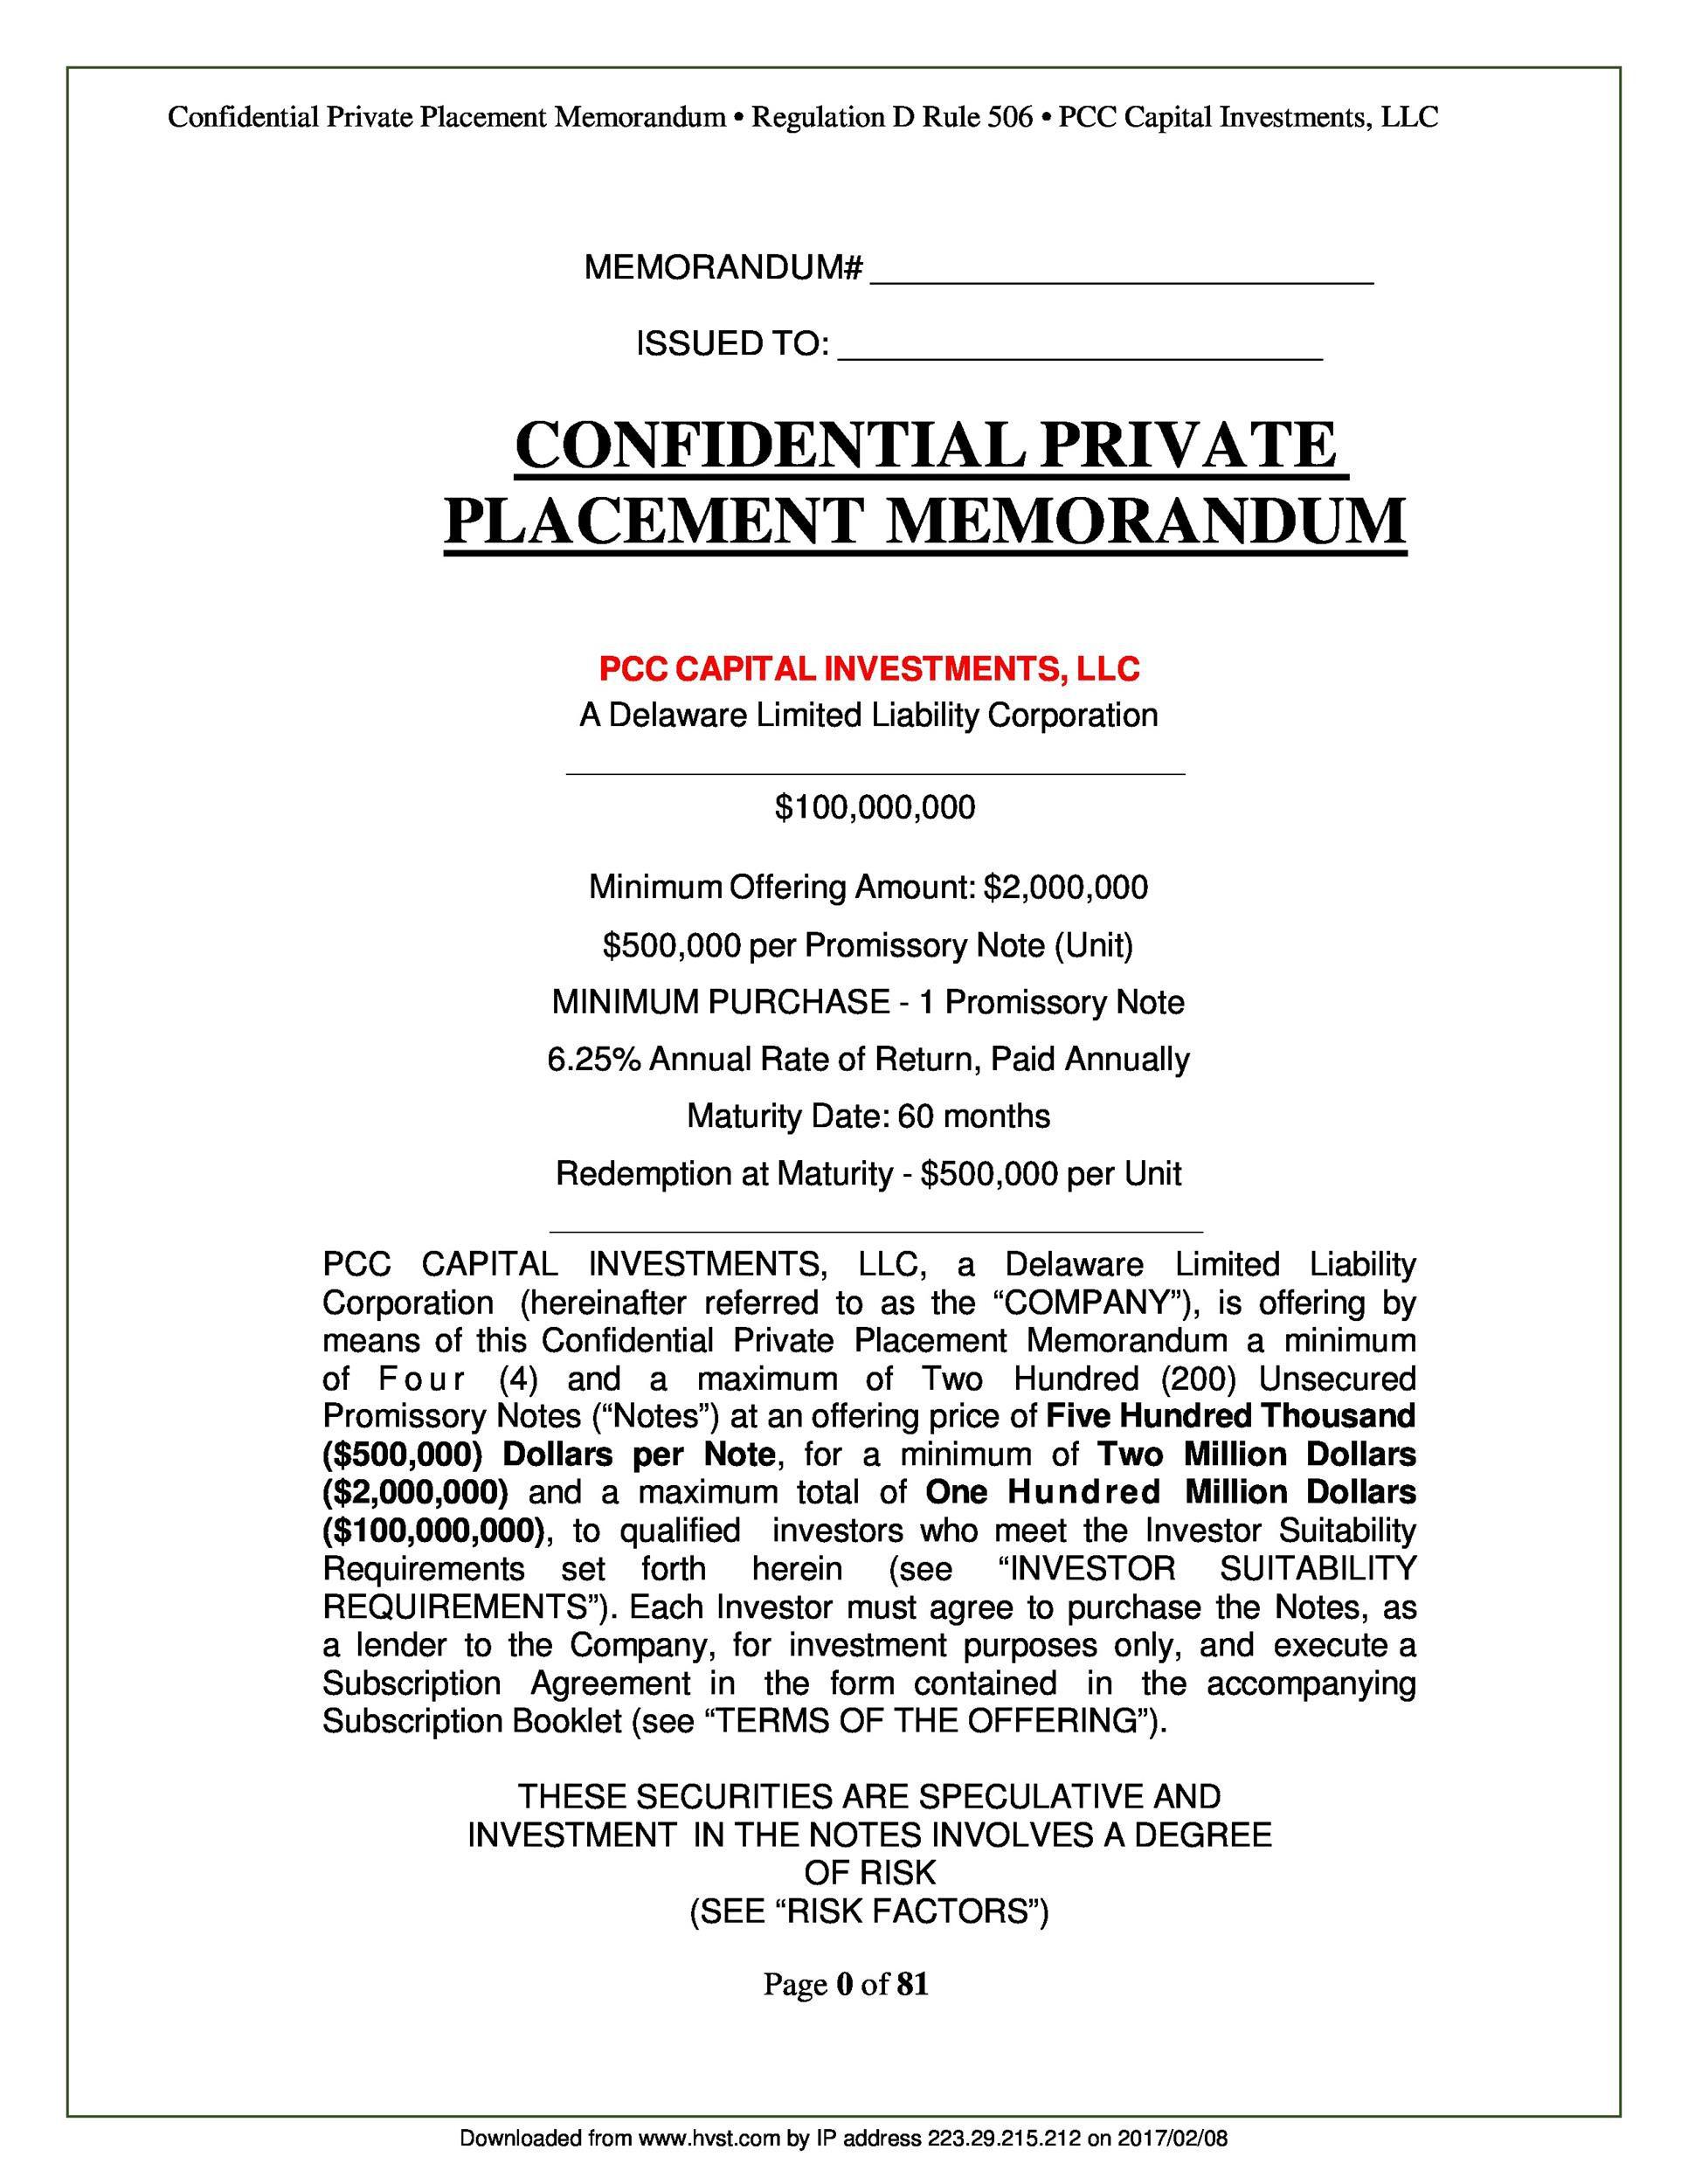 003 Fascinating Private Placement Memorandum Example Highest Clarity  Examples Offering Sample TemplateFull